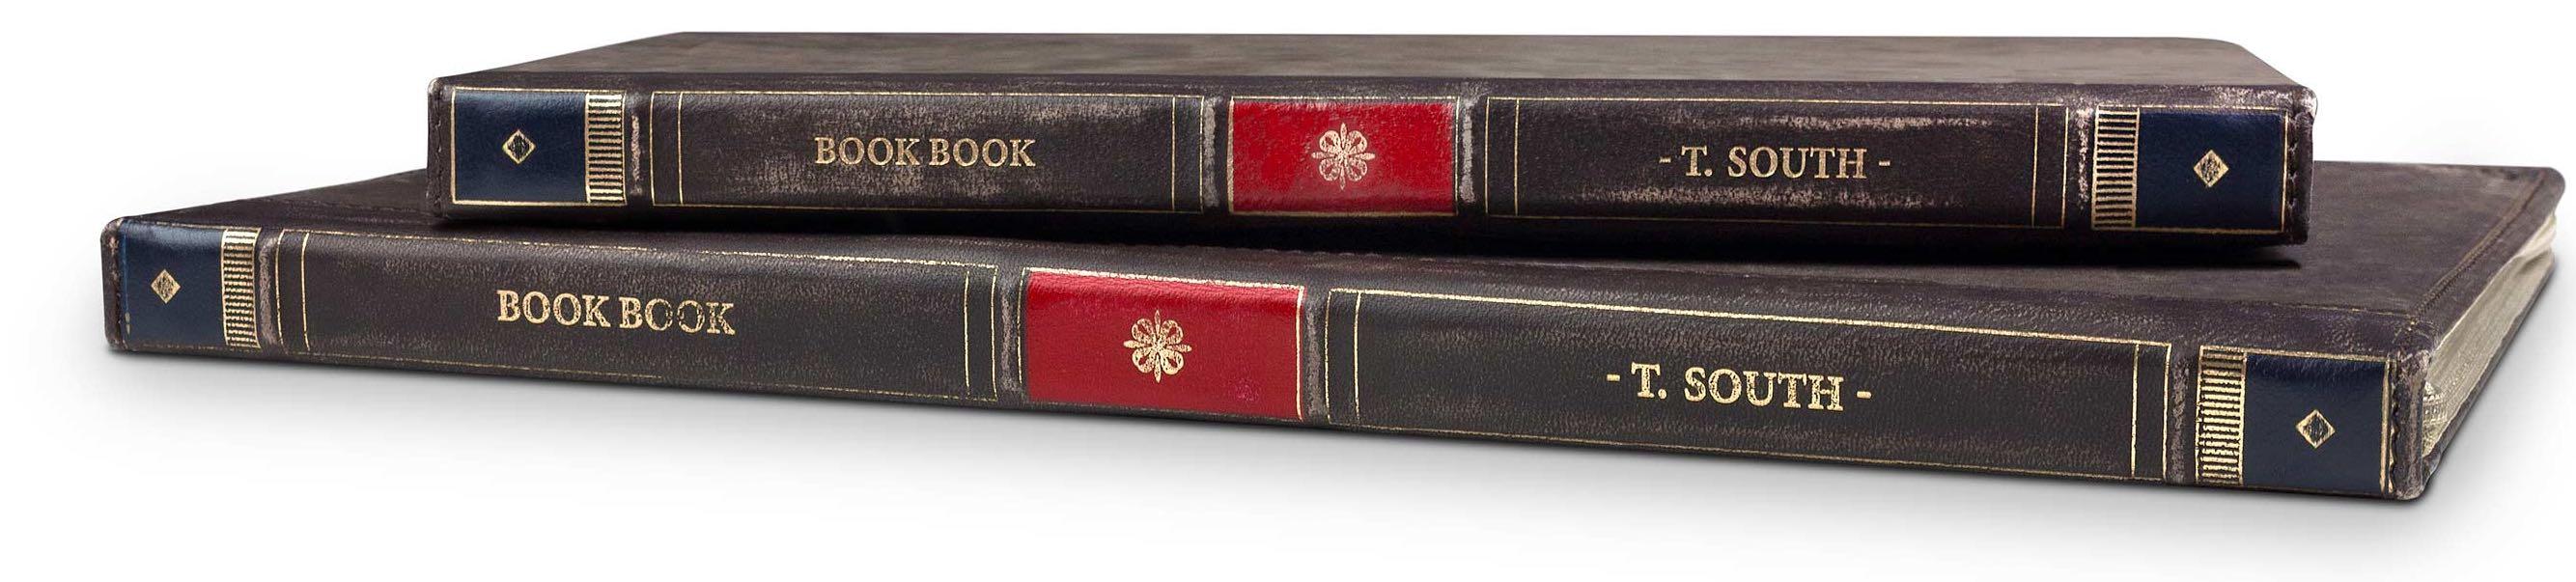 Twelve South BookBook for iPad Pro image 008